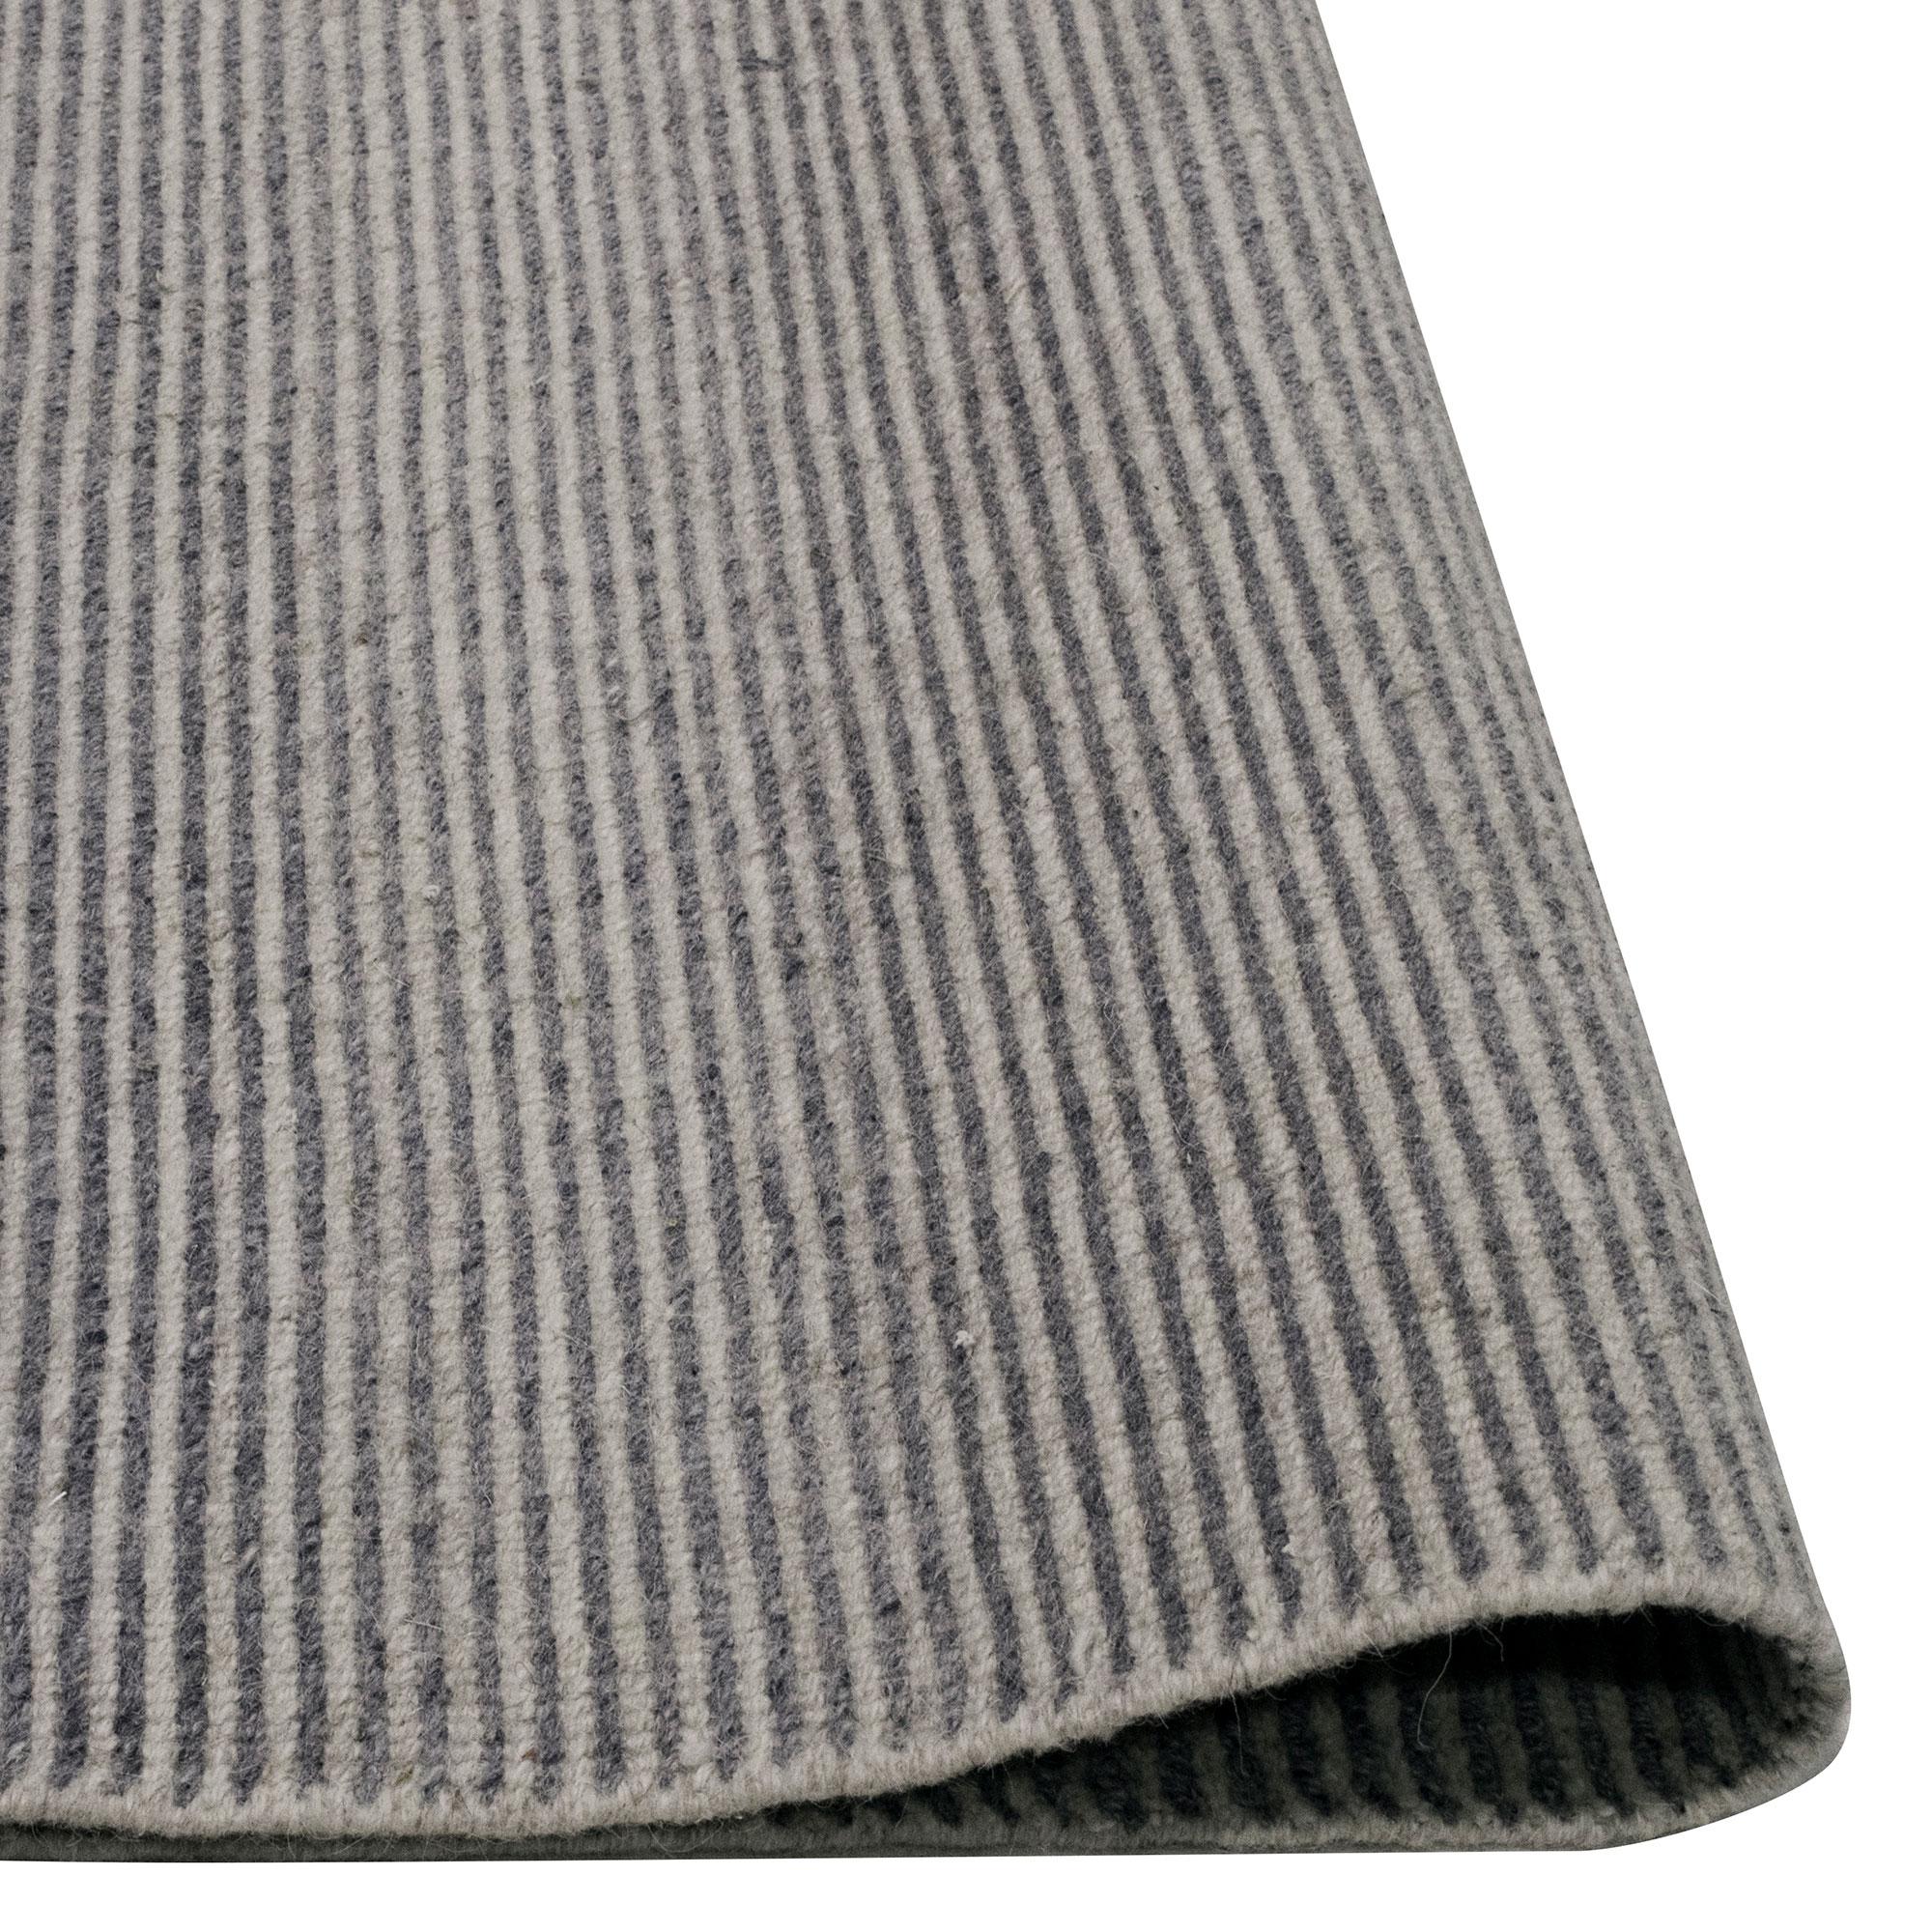 Boheme-steel-200x300_foldback